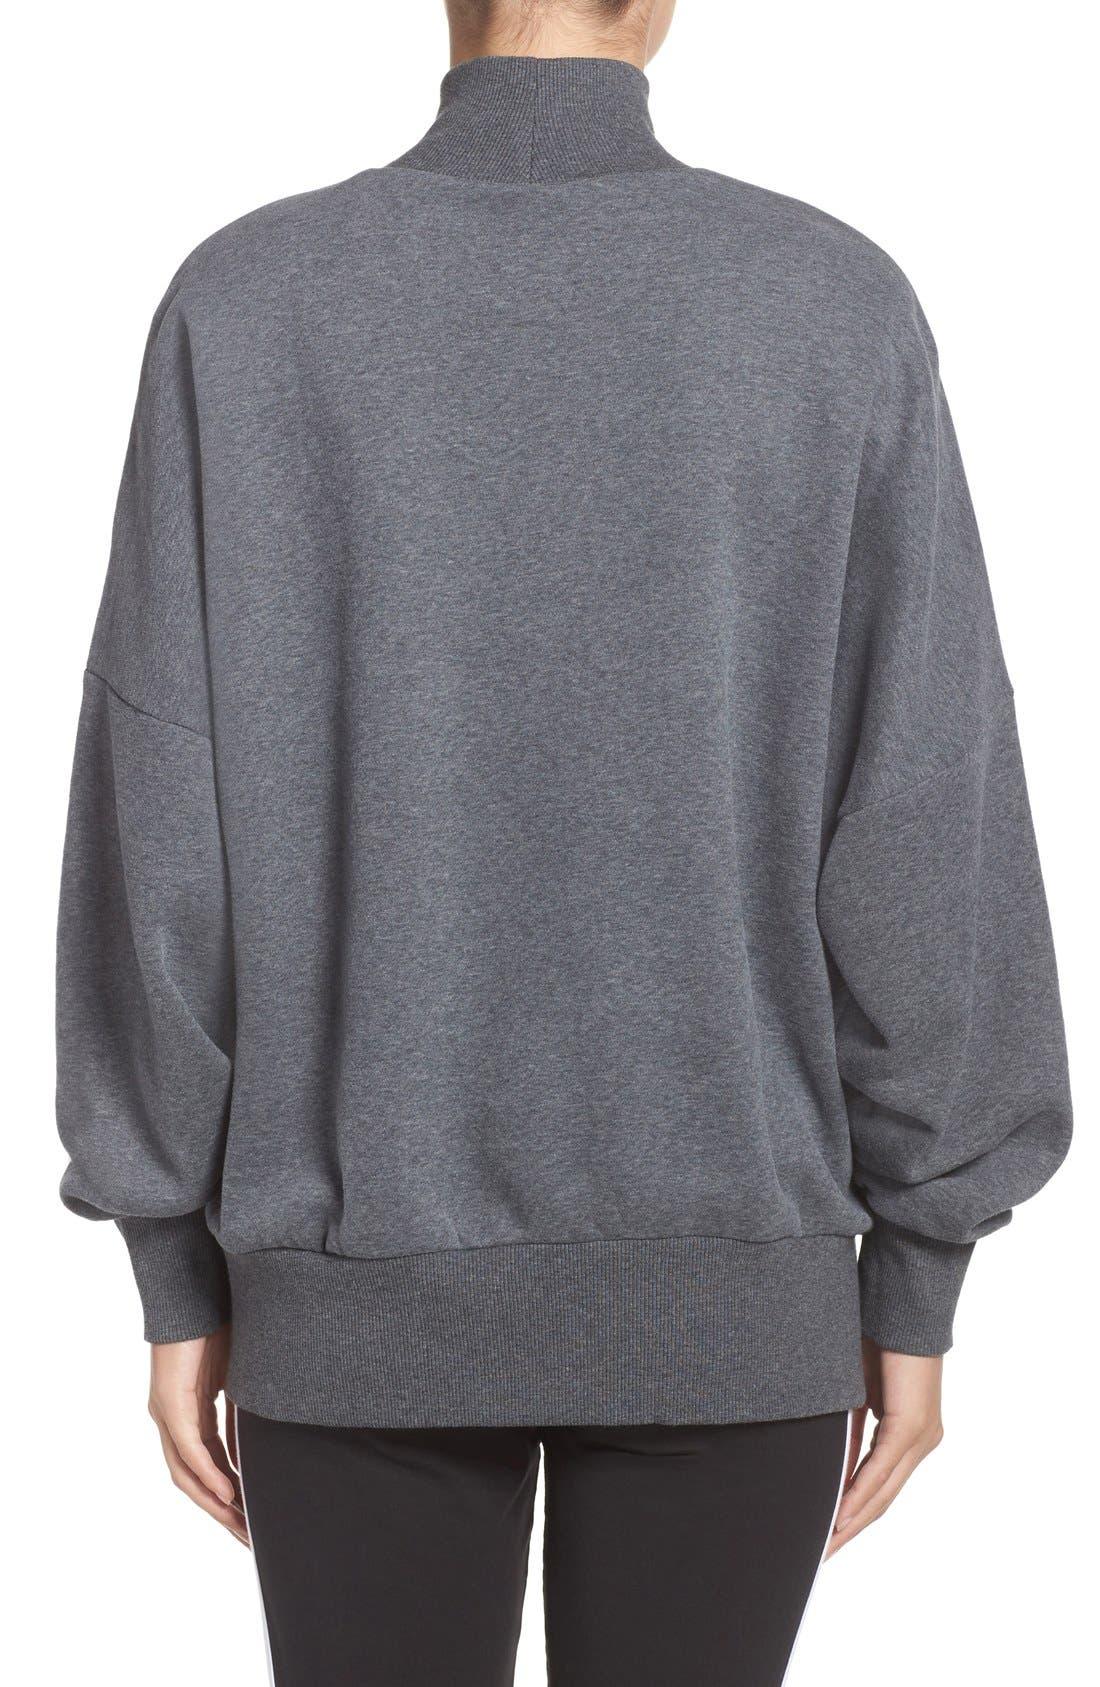 Alternate Image 2  - adidas Originals Mock Neck Sweatshirt